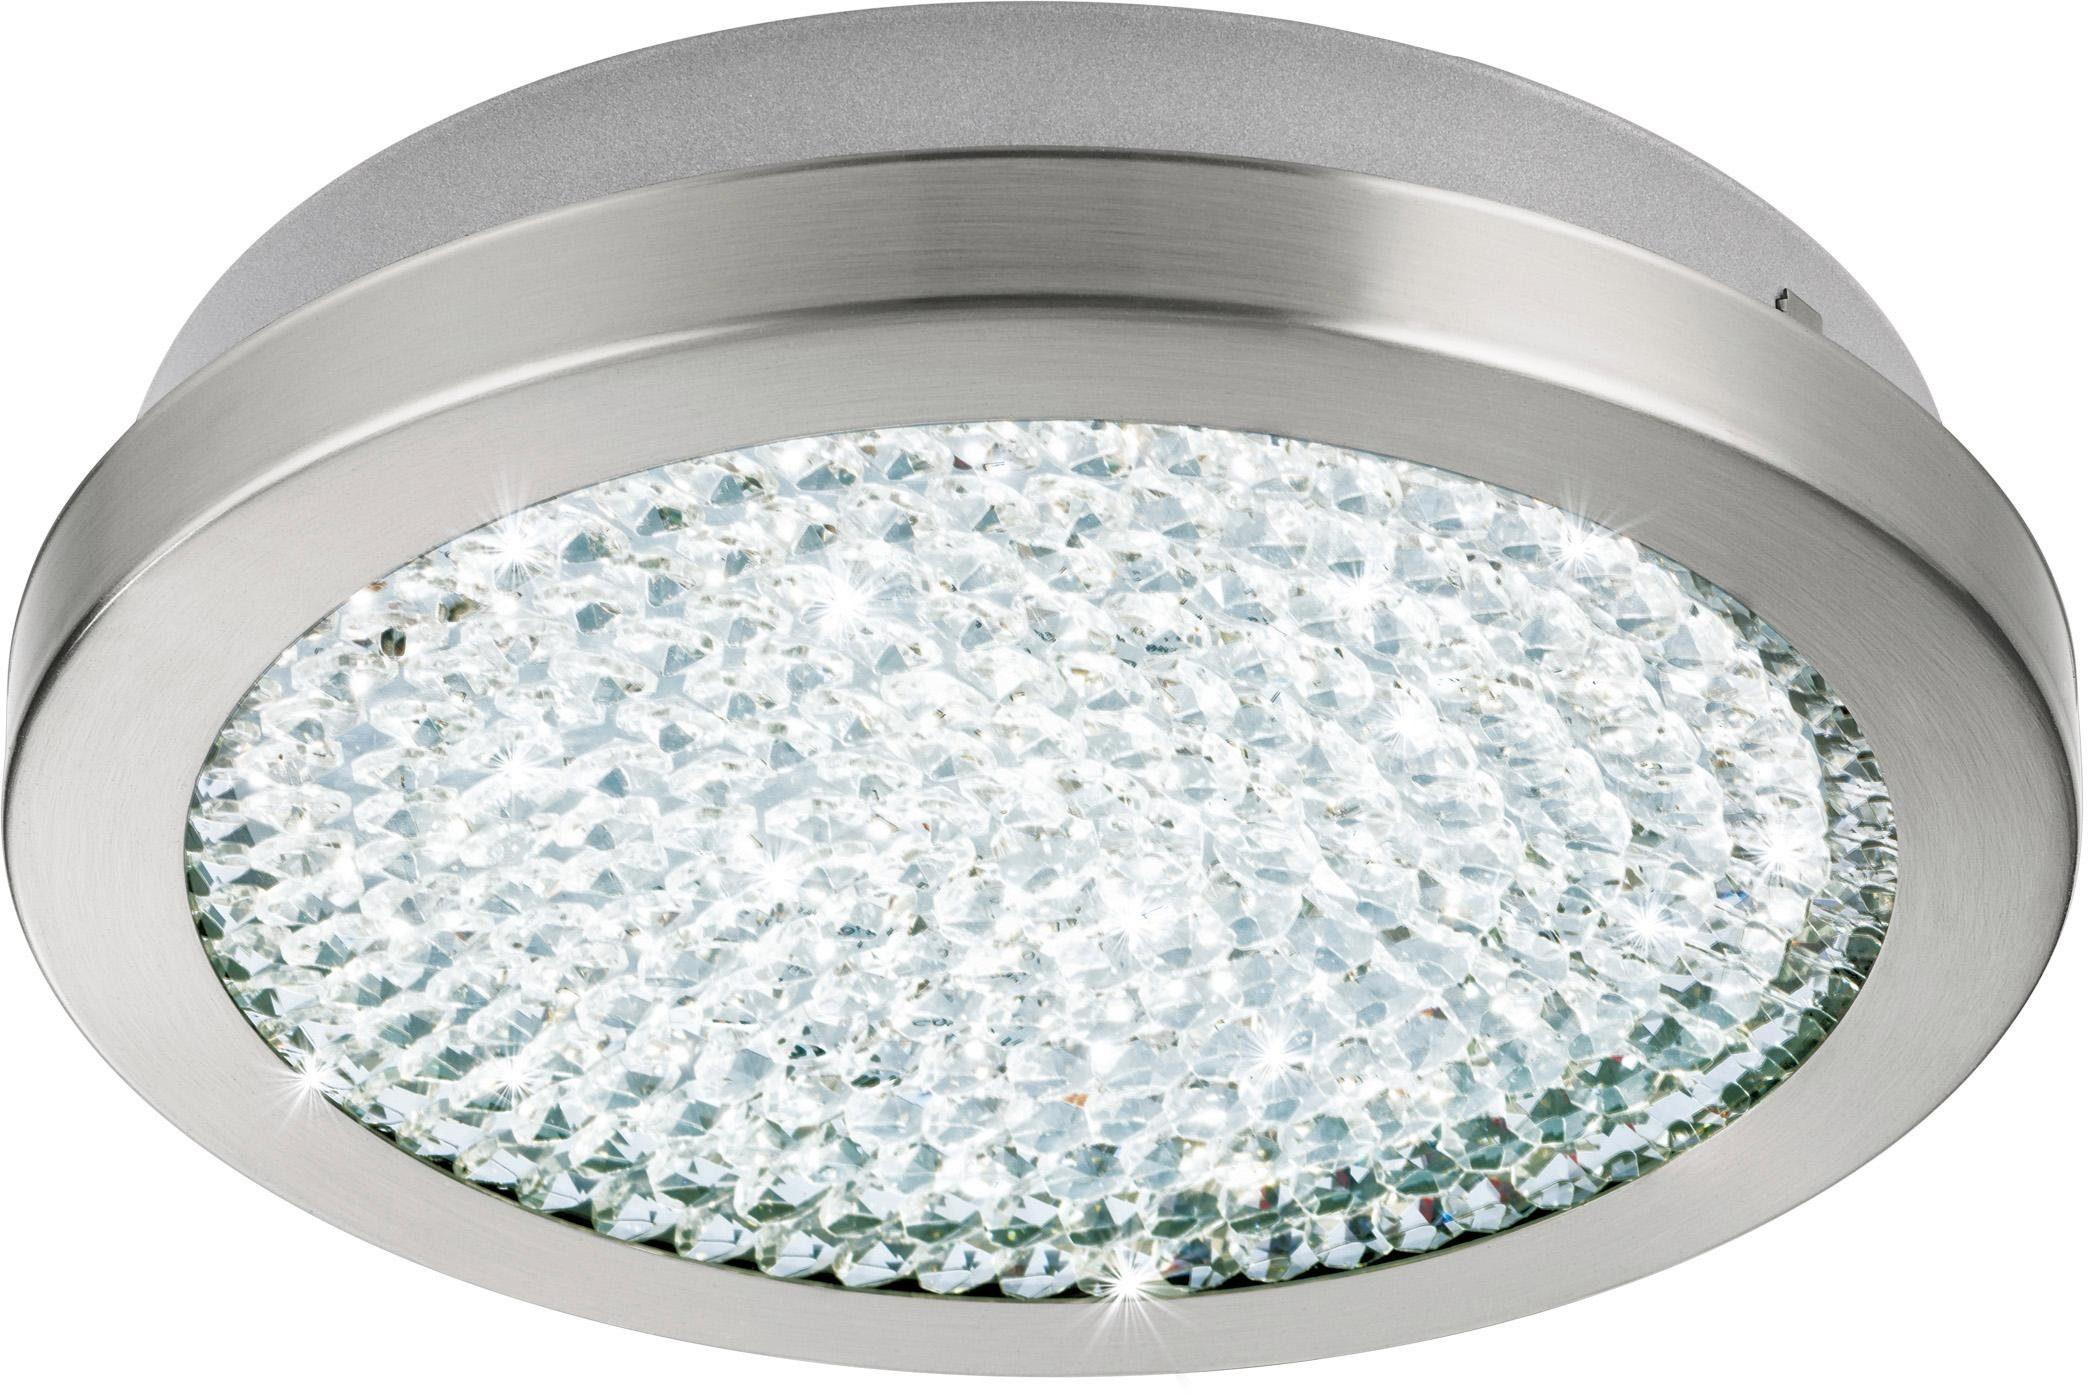 EGLO LED Deckenleuchte AREZZO 2, LED-Board, Neutralweiß, LED Deckenlampe